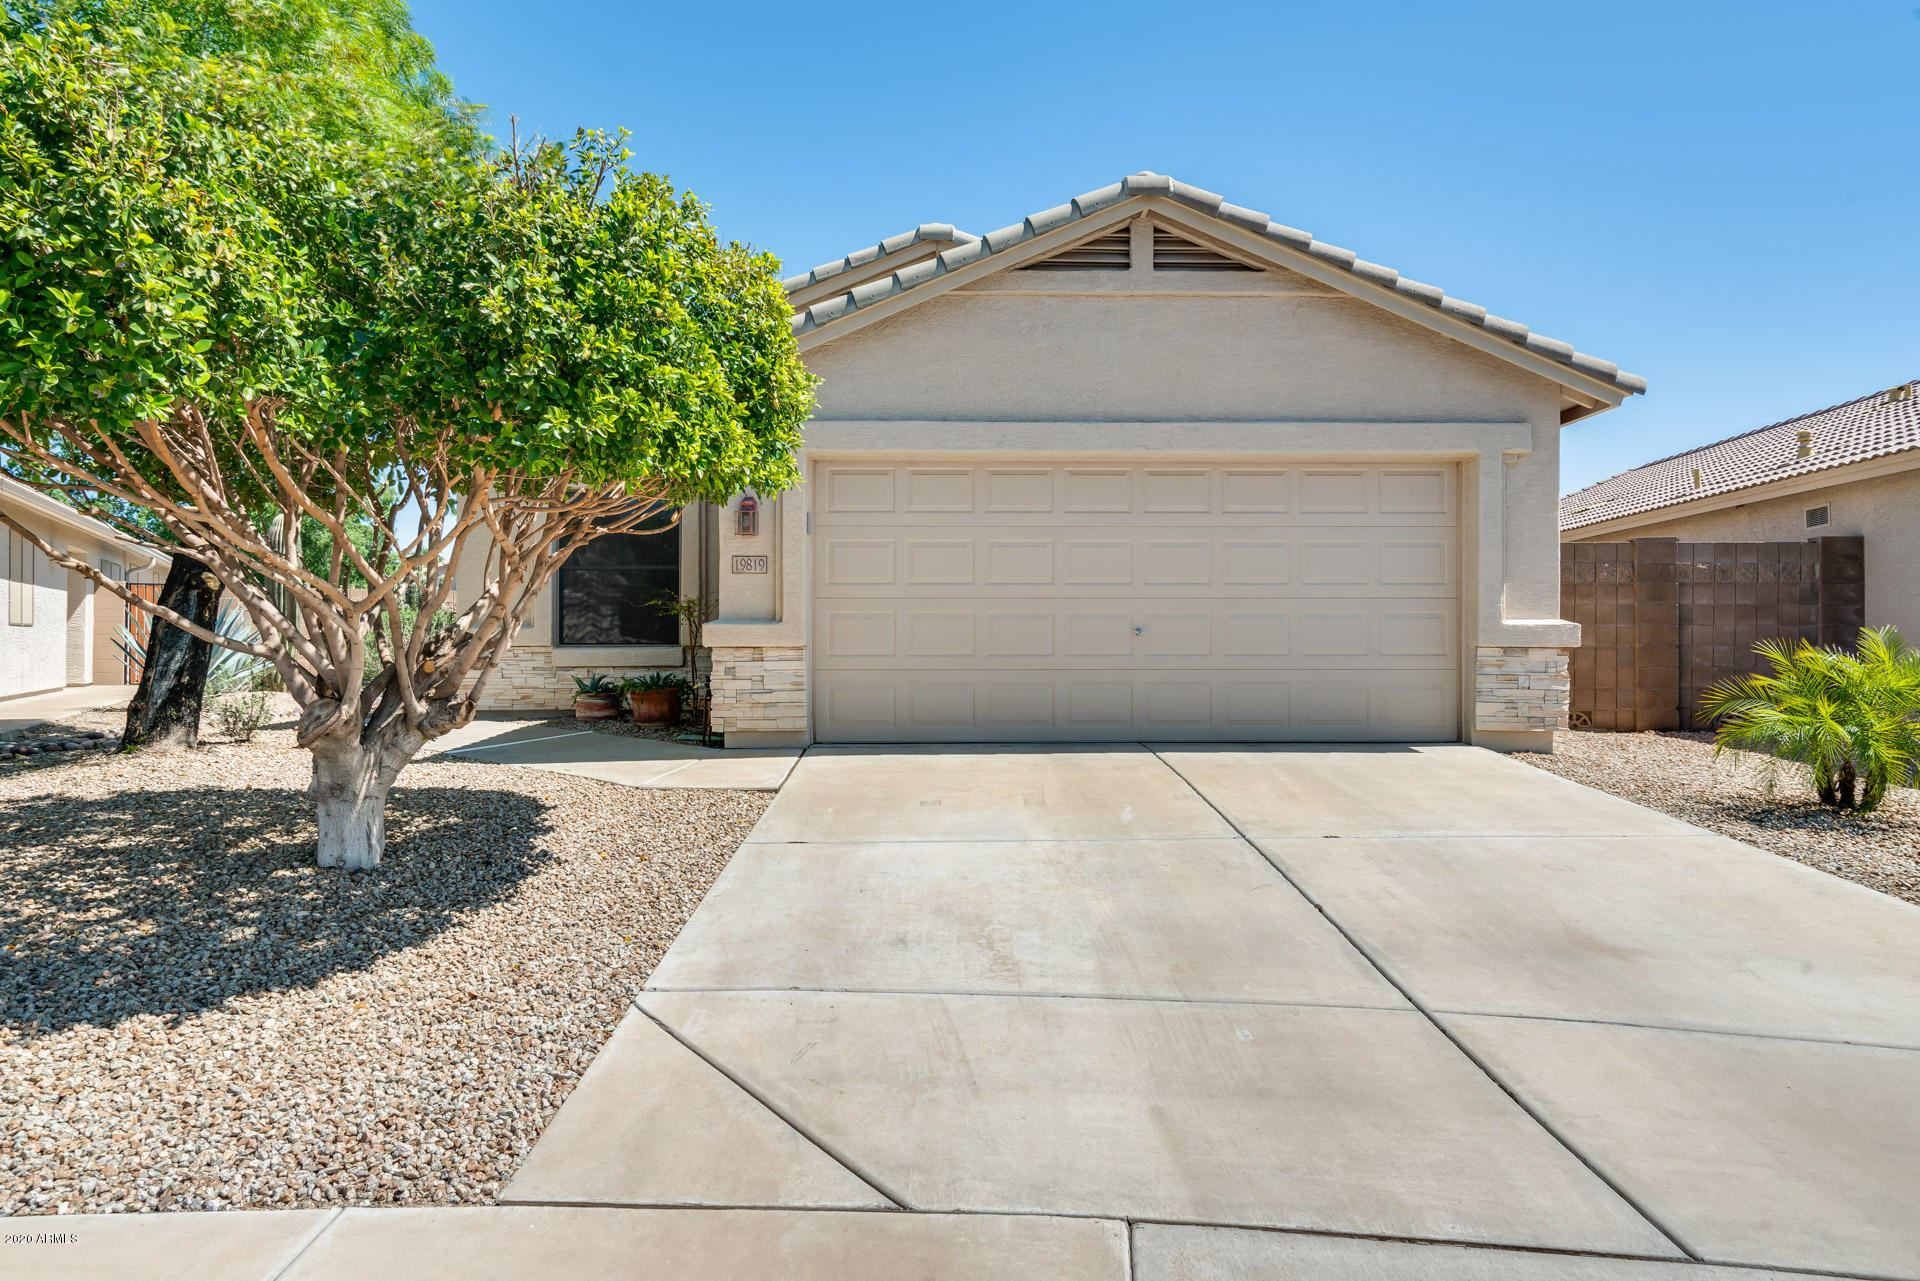 19819 N 34TH Place, Phoenix, AZ 85050 - MLS#: 6098158